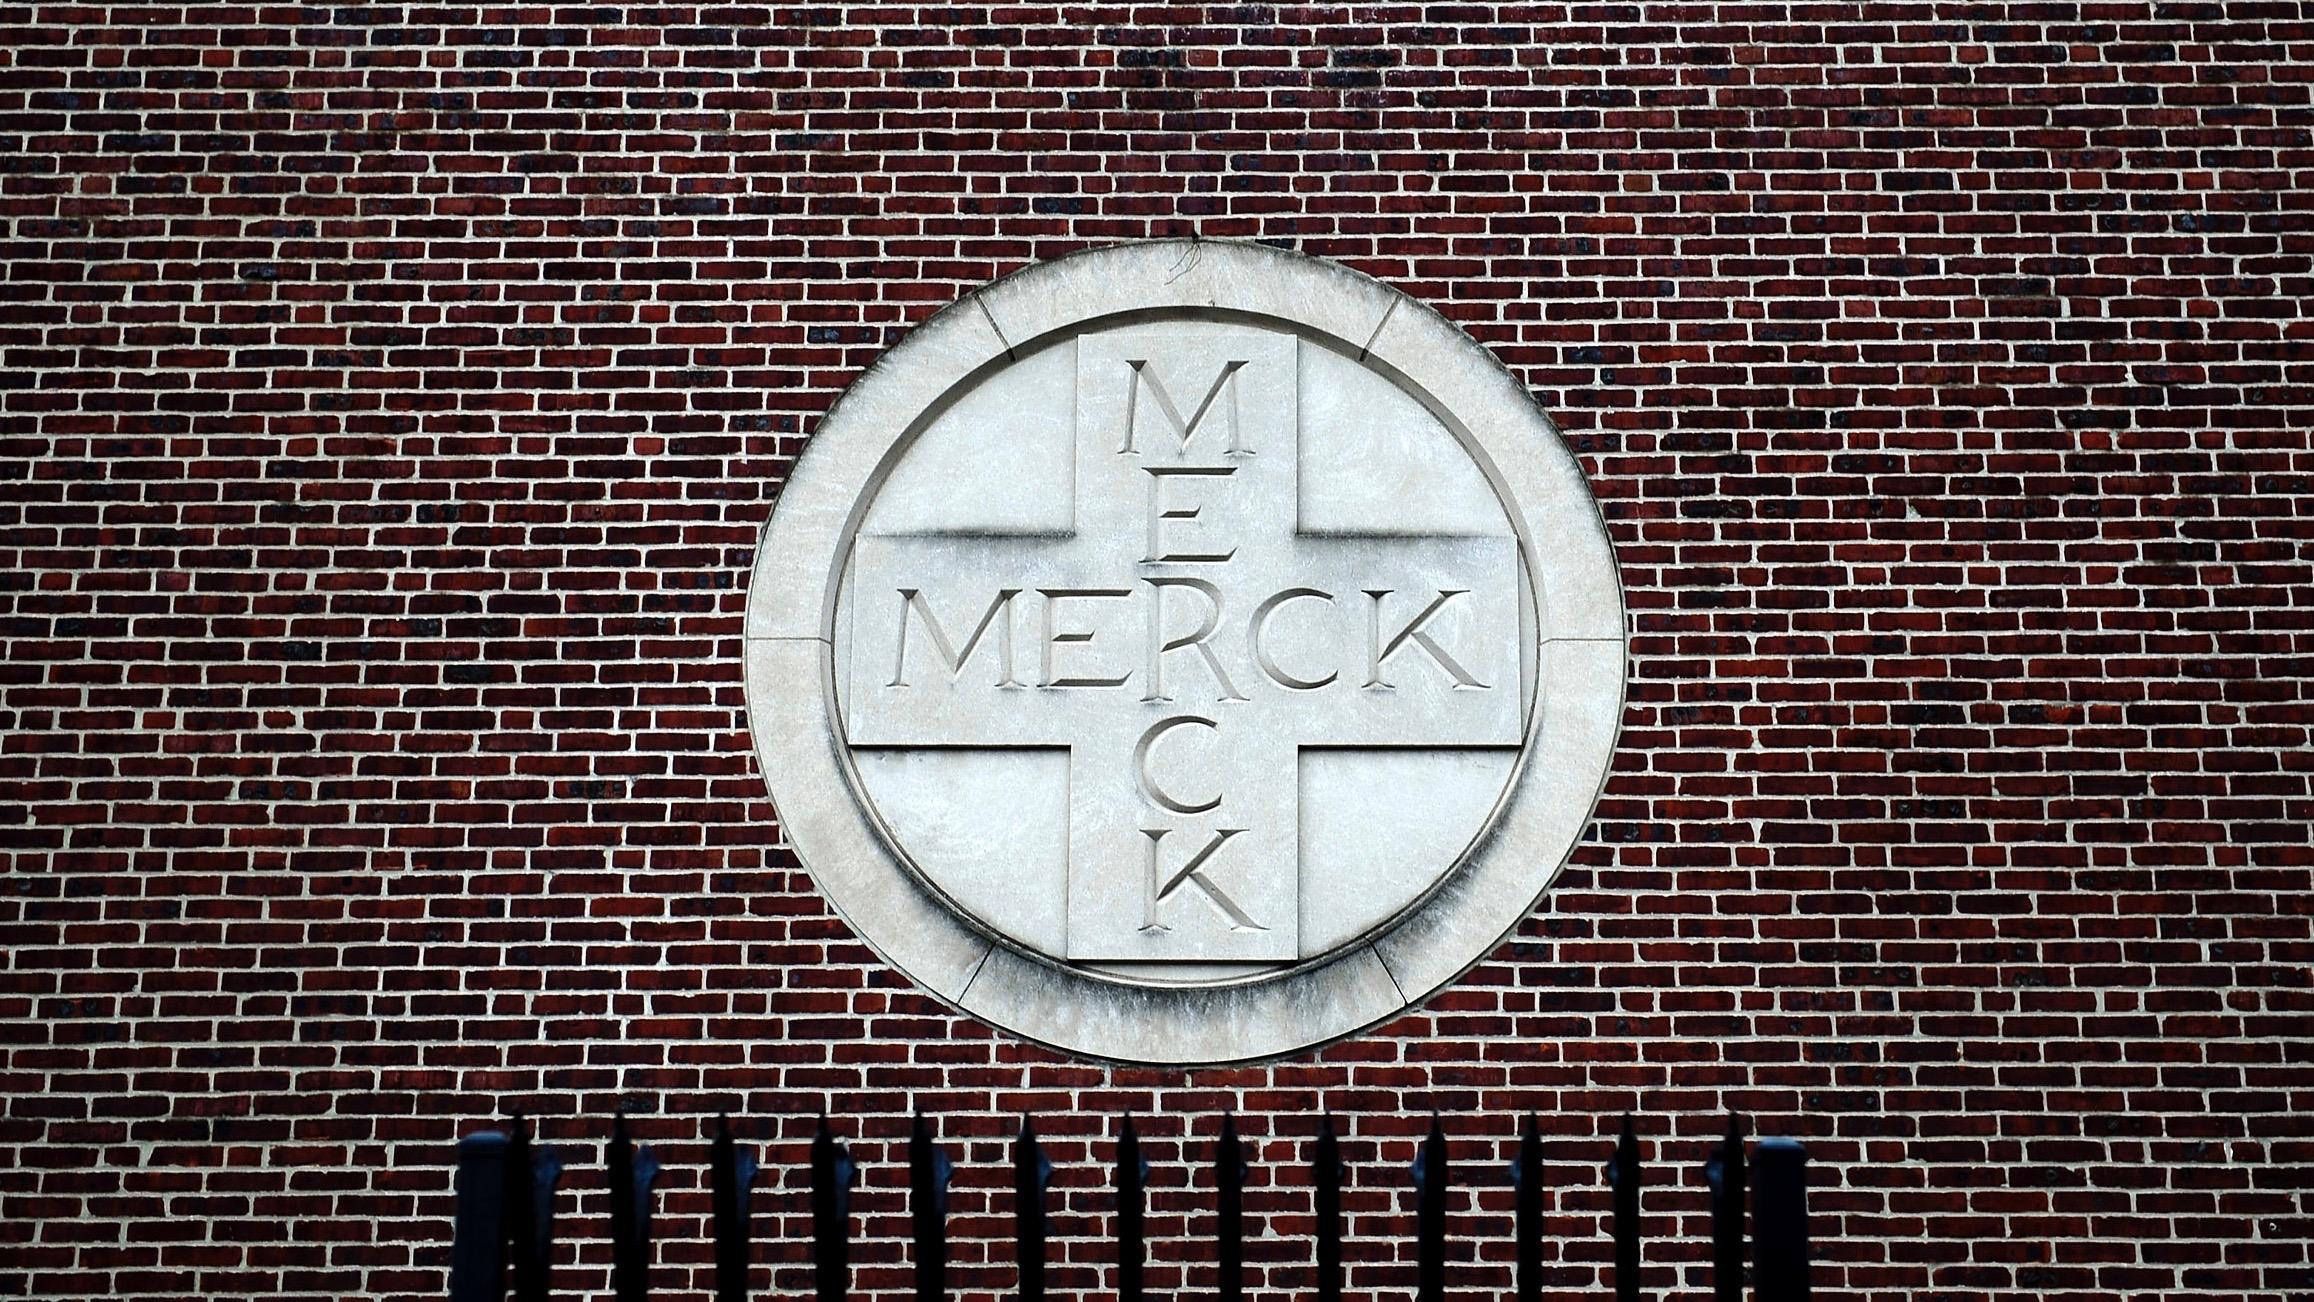 Merck & Co. campus in Linden, New Jersey.